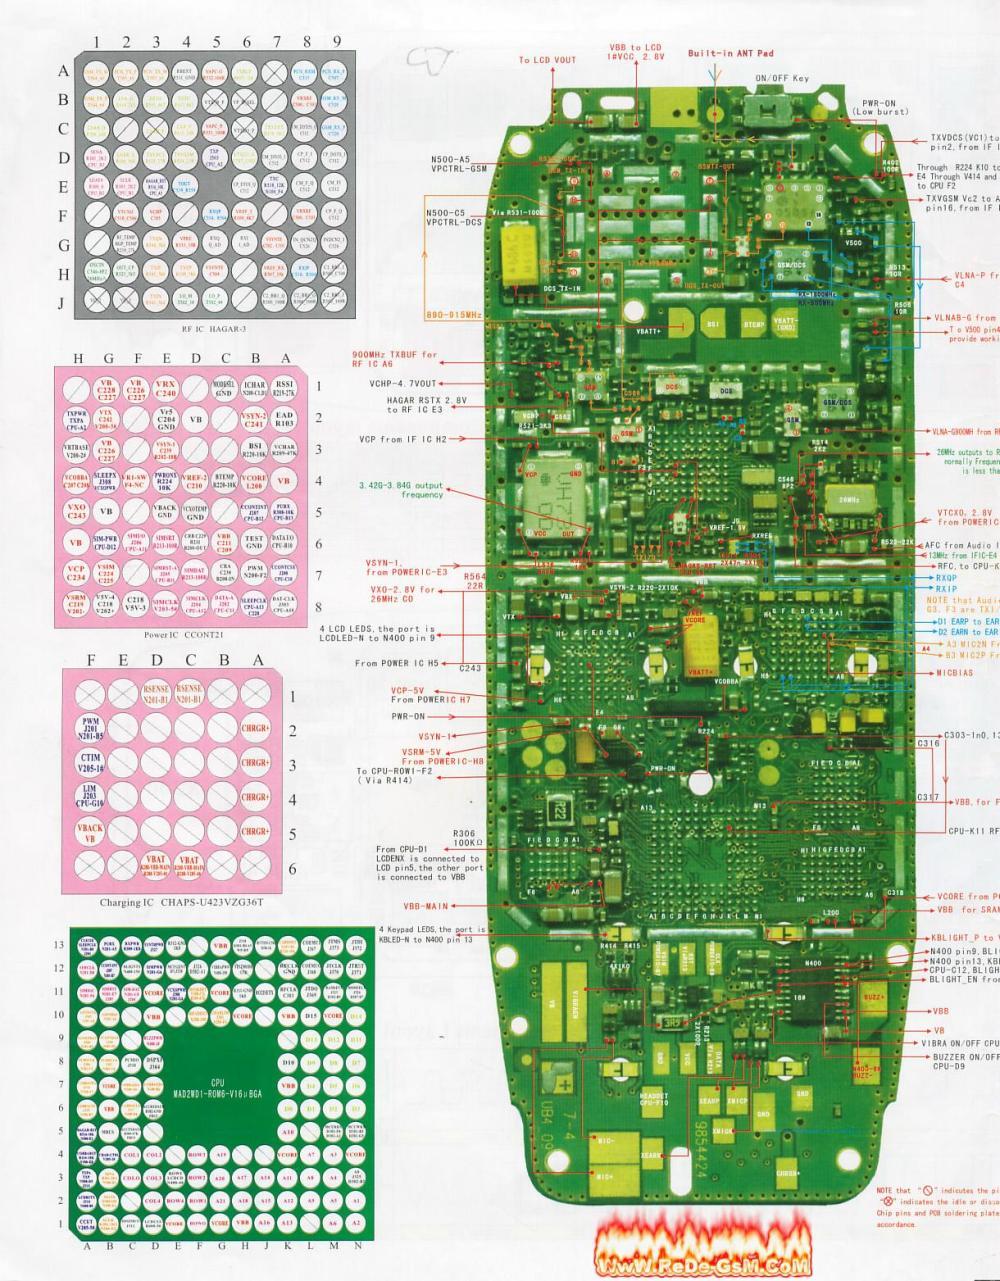 medium resolution of nokia 3310 schematics and diagrames 4g nokia 3310 circuit diagram nokia 3310